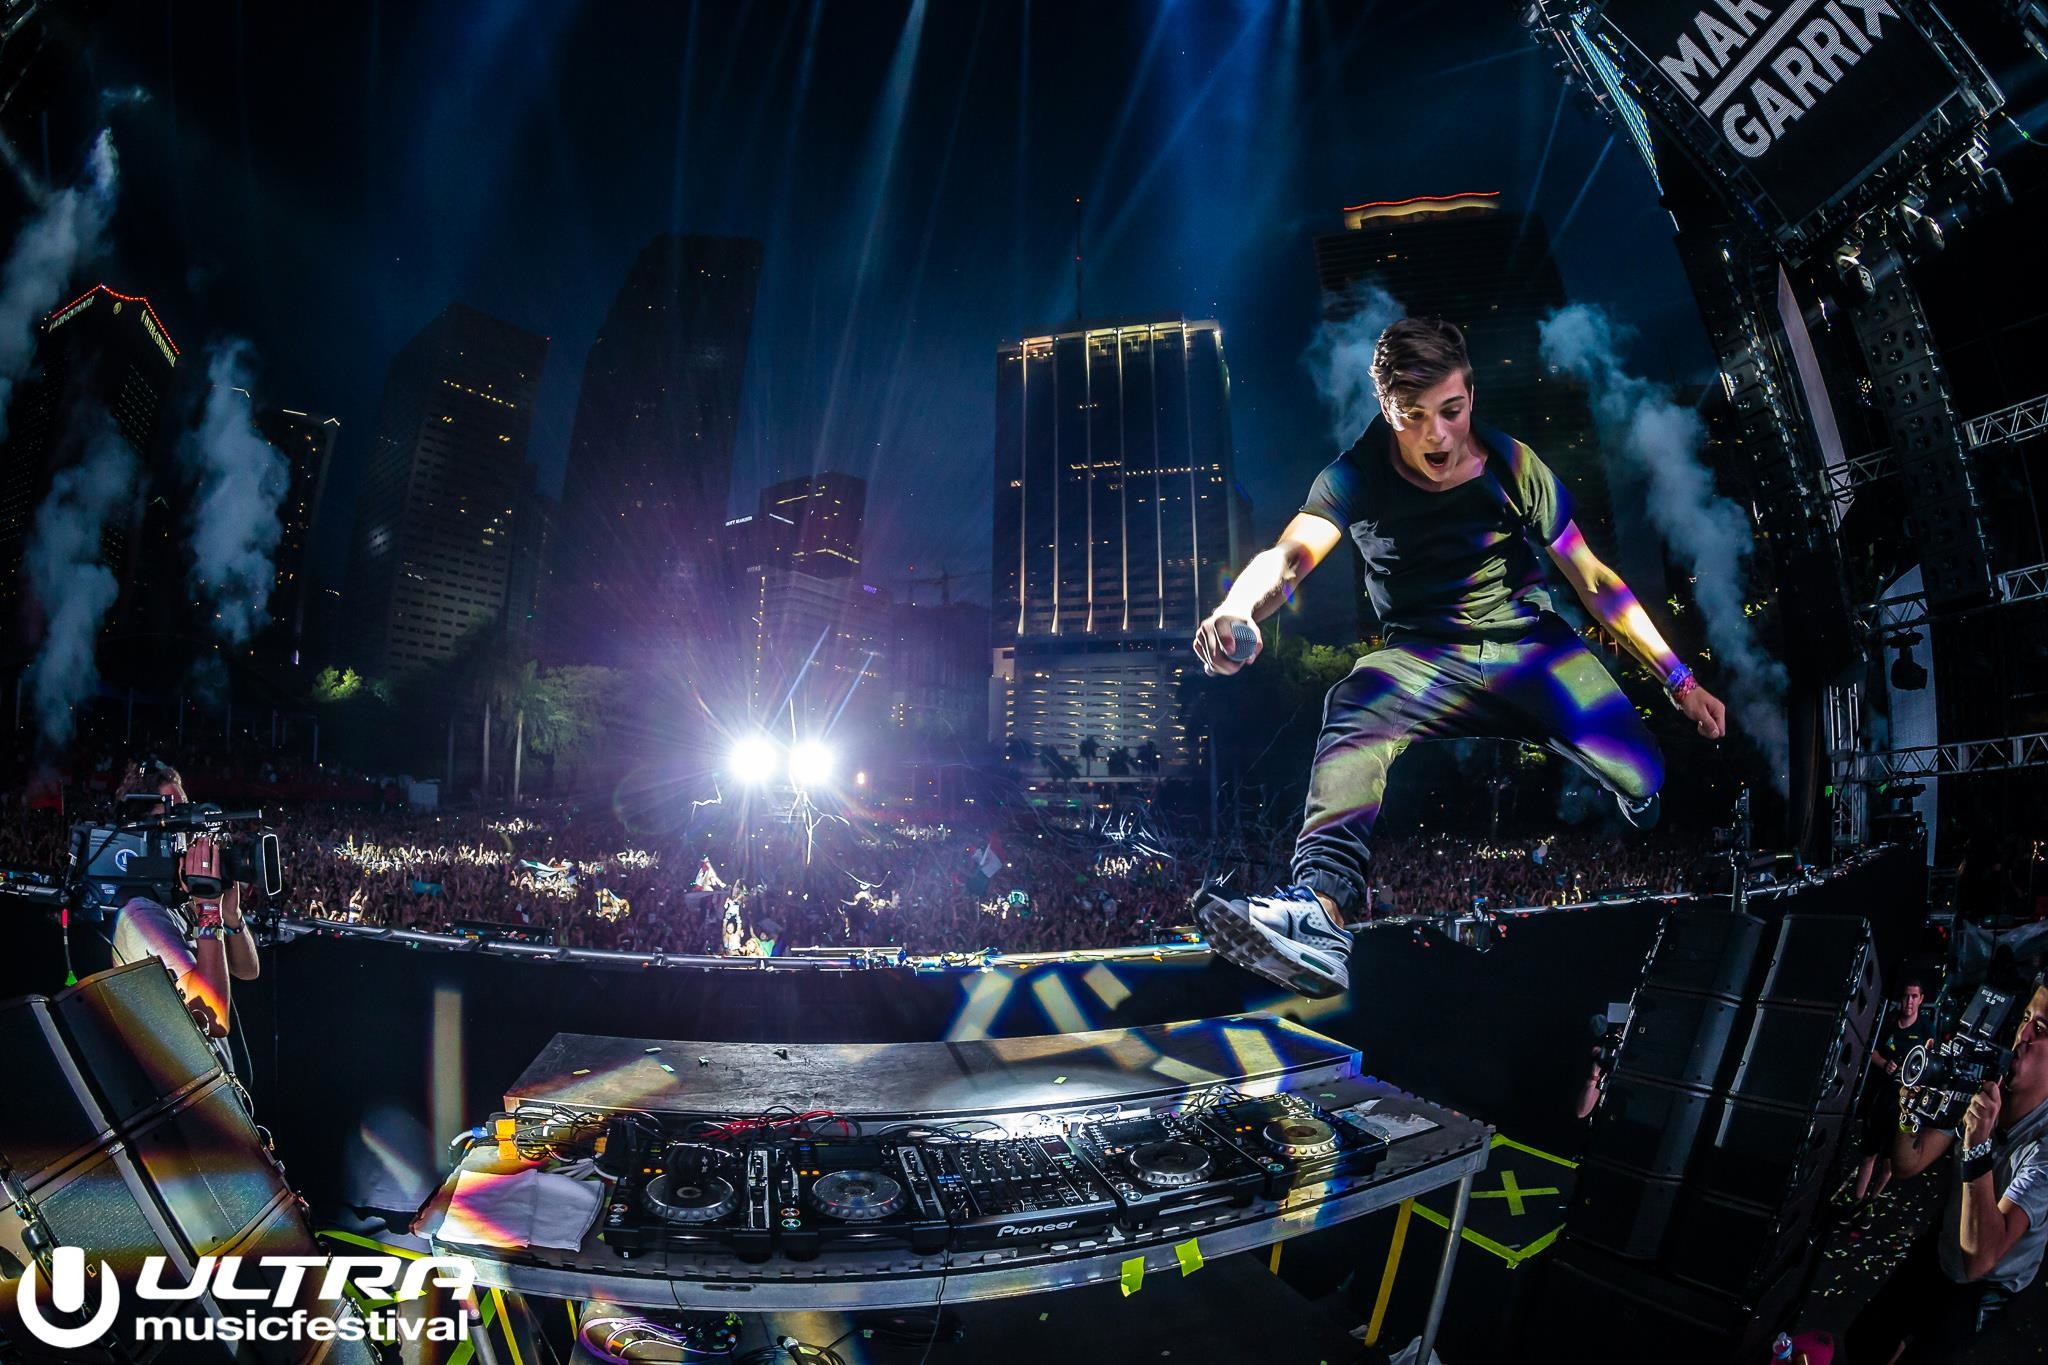 Download Ultra Music Festival Wallpaper Hd Gallery: Ultra Music Festival Wallpapers (85+ Images